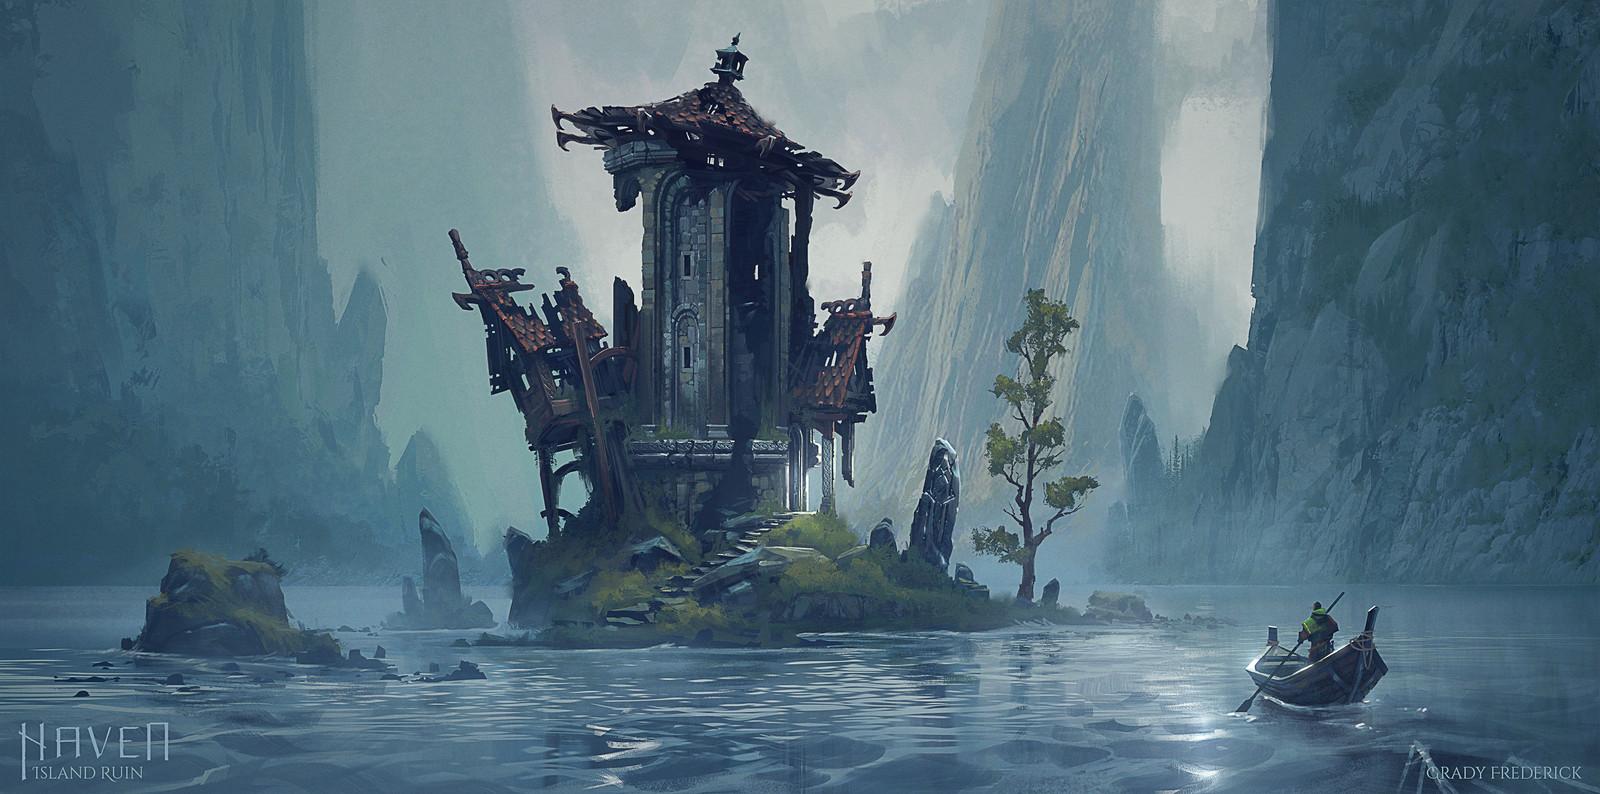 Haven - Island Ruin